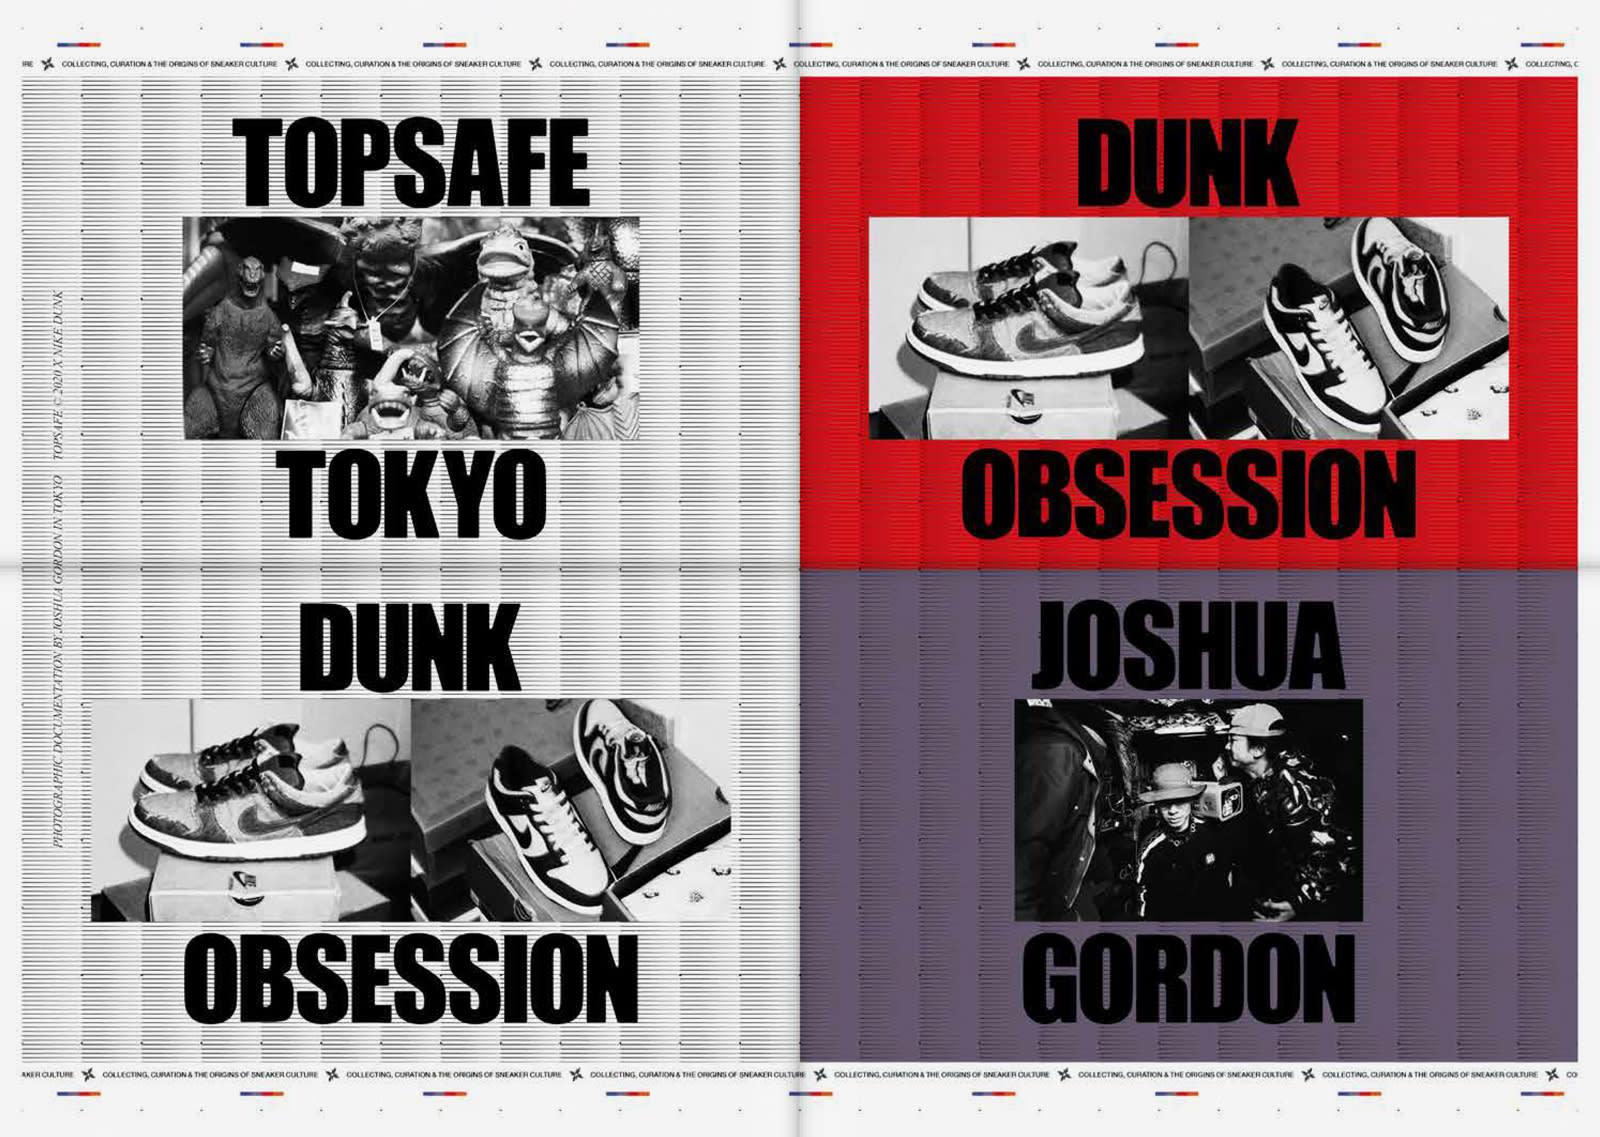 Nike Dunk Tokyo Obsession Zine shot by Joshua Gordon